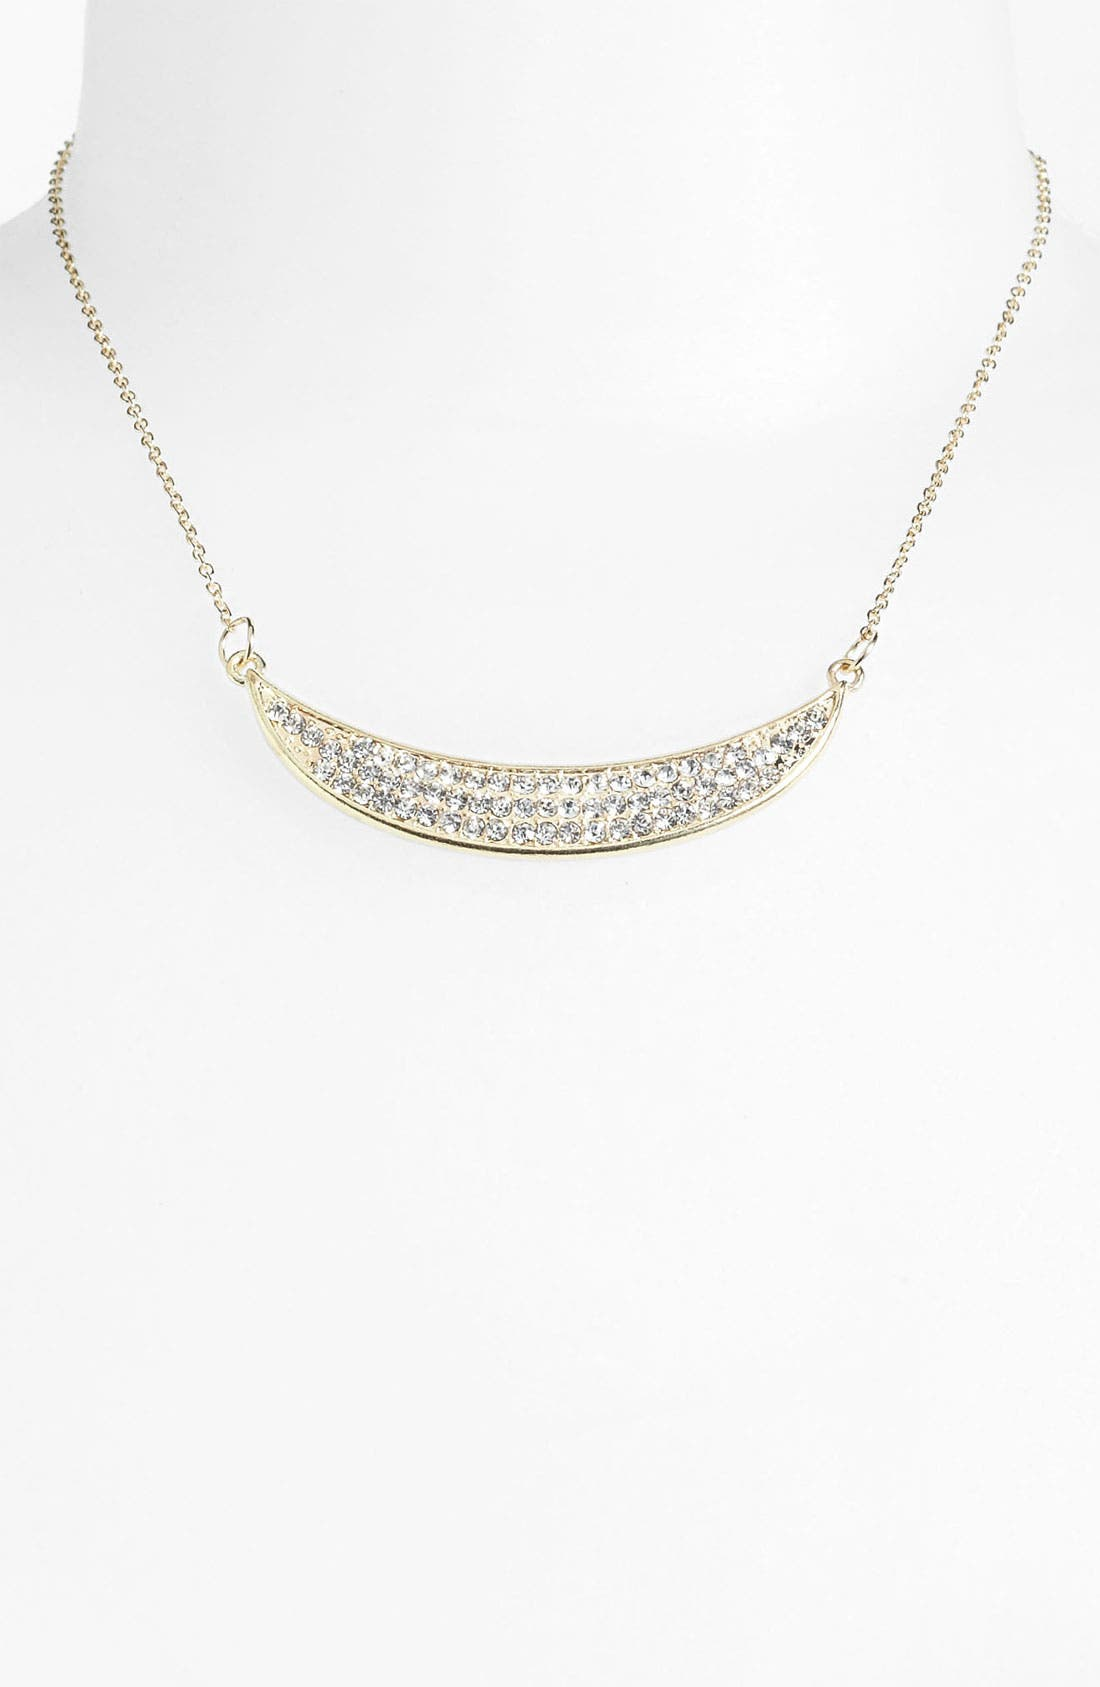 Main Image - Carole Rhinestone Crescent Necklace